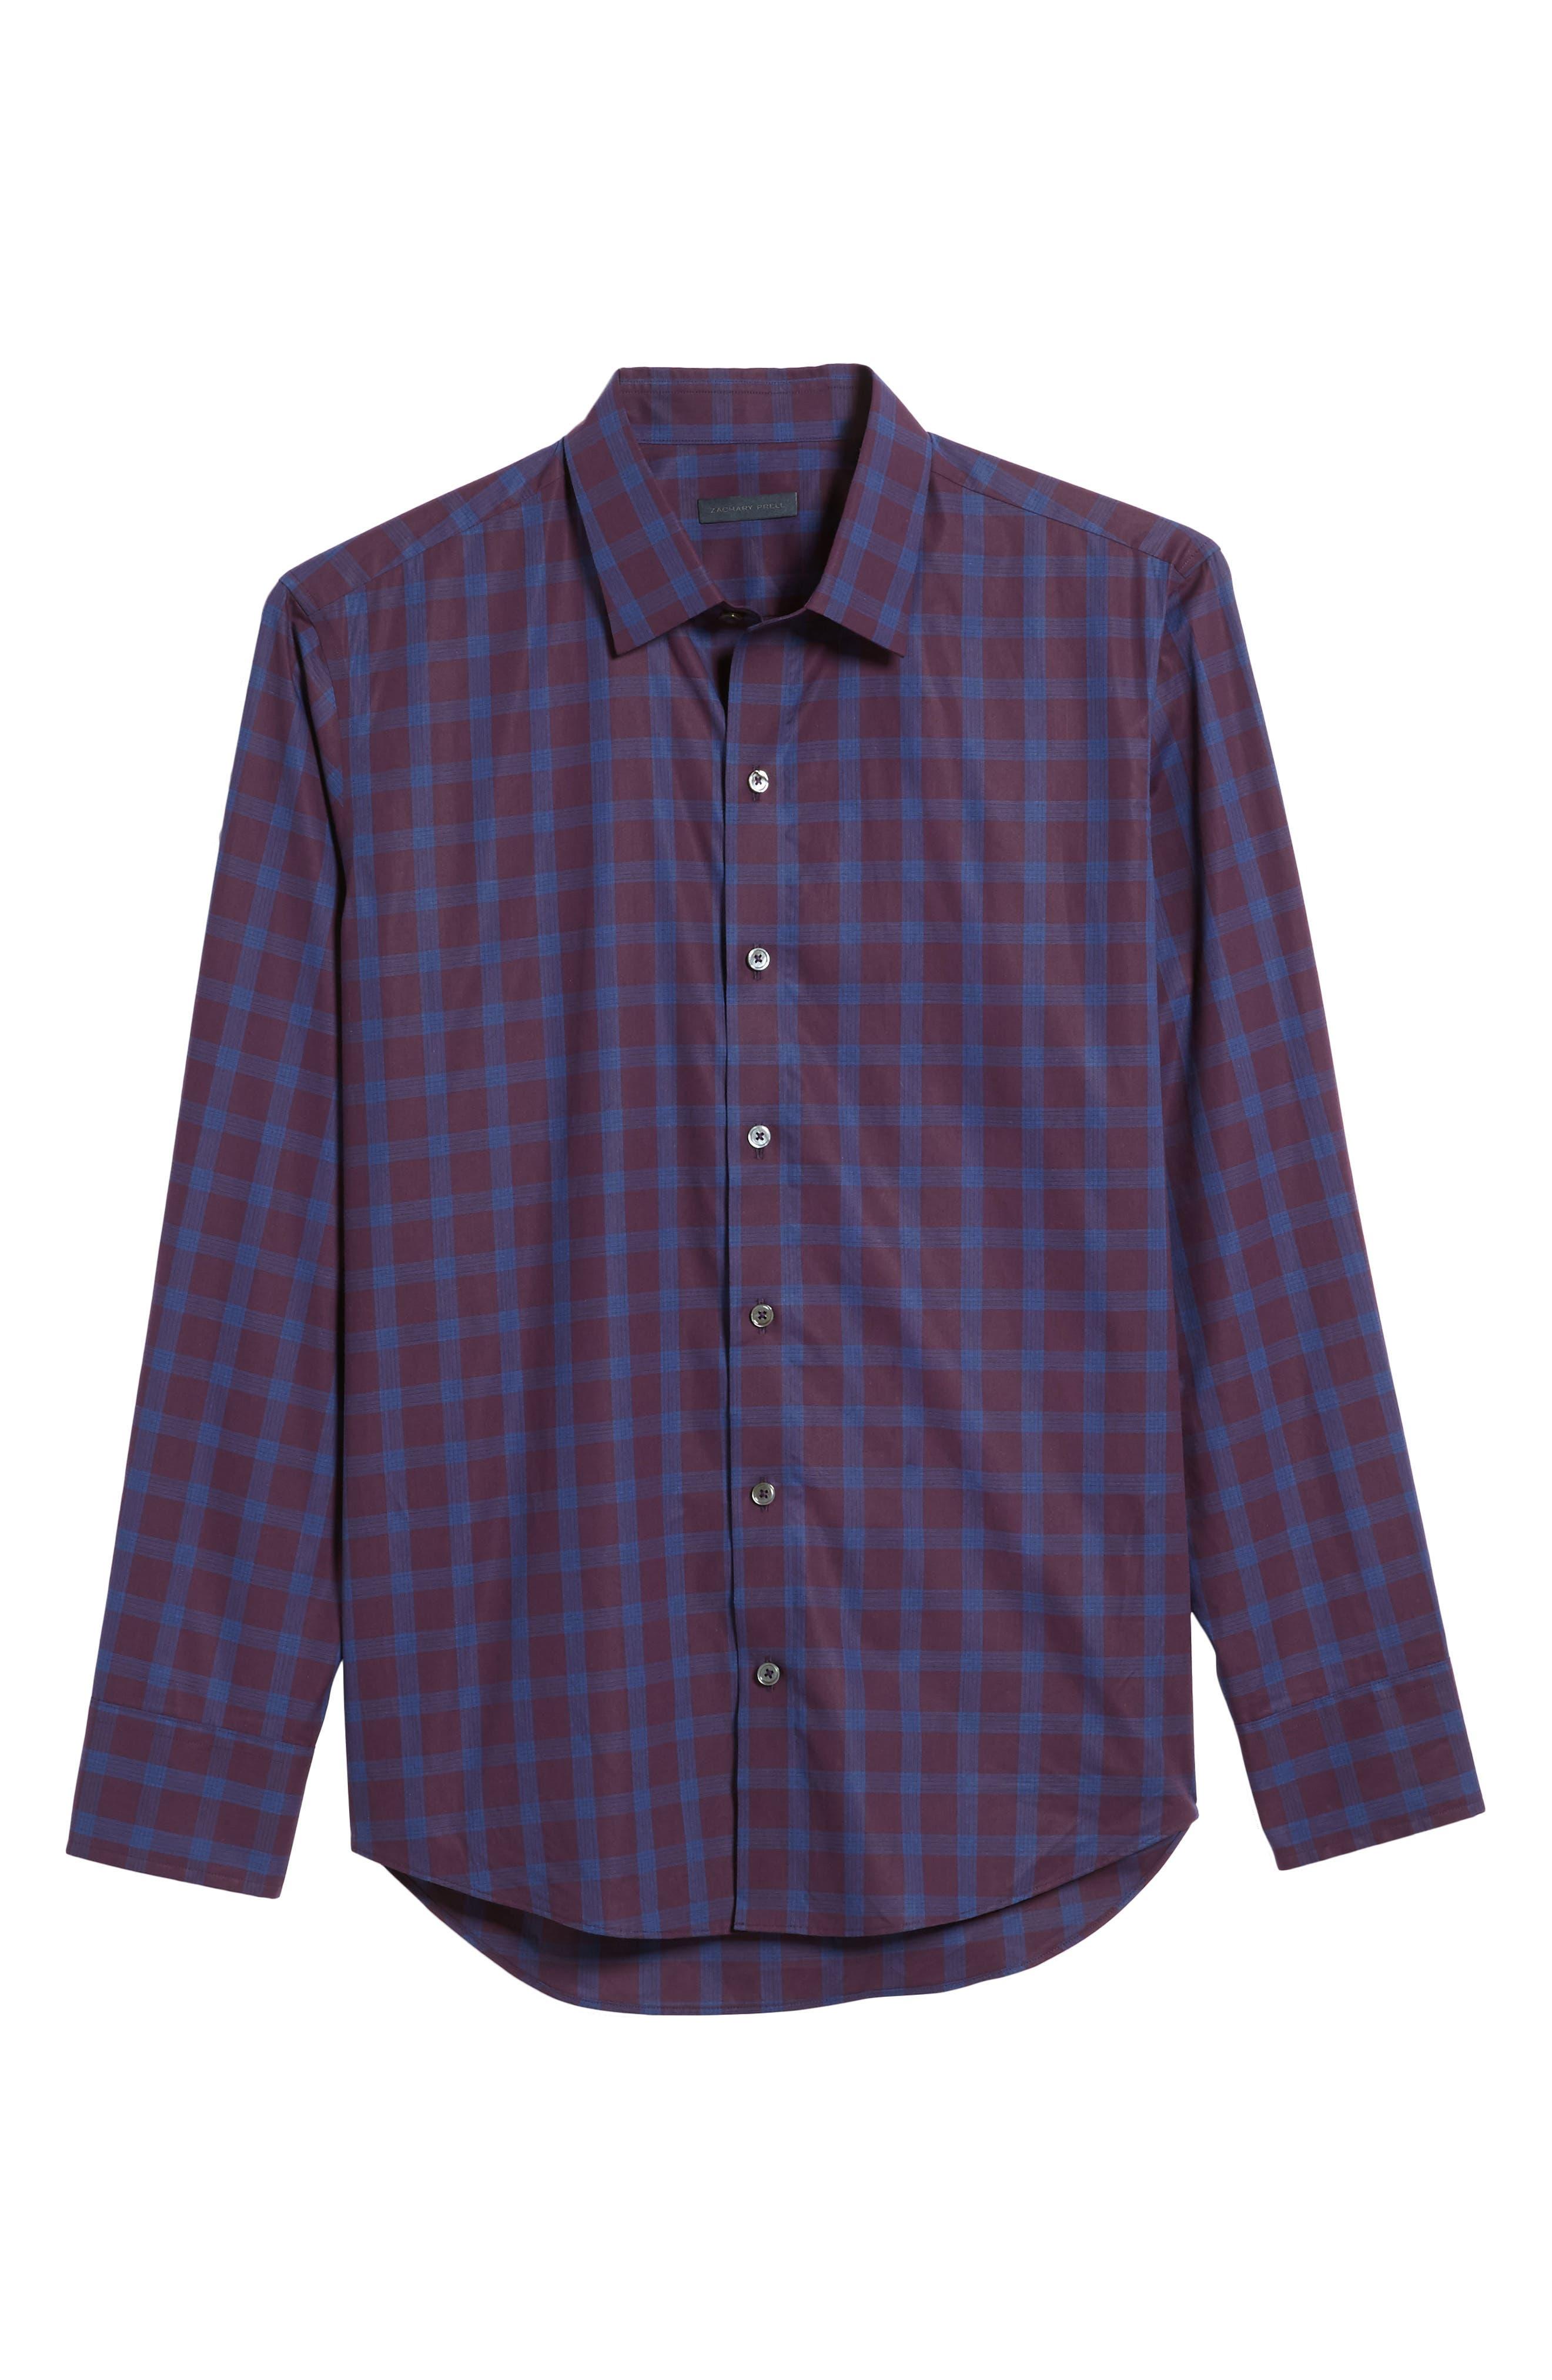 Raymond Check Sport Shirt,                             Alternate thumbnail 6, color,                             930